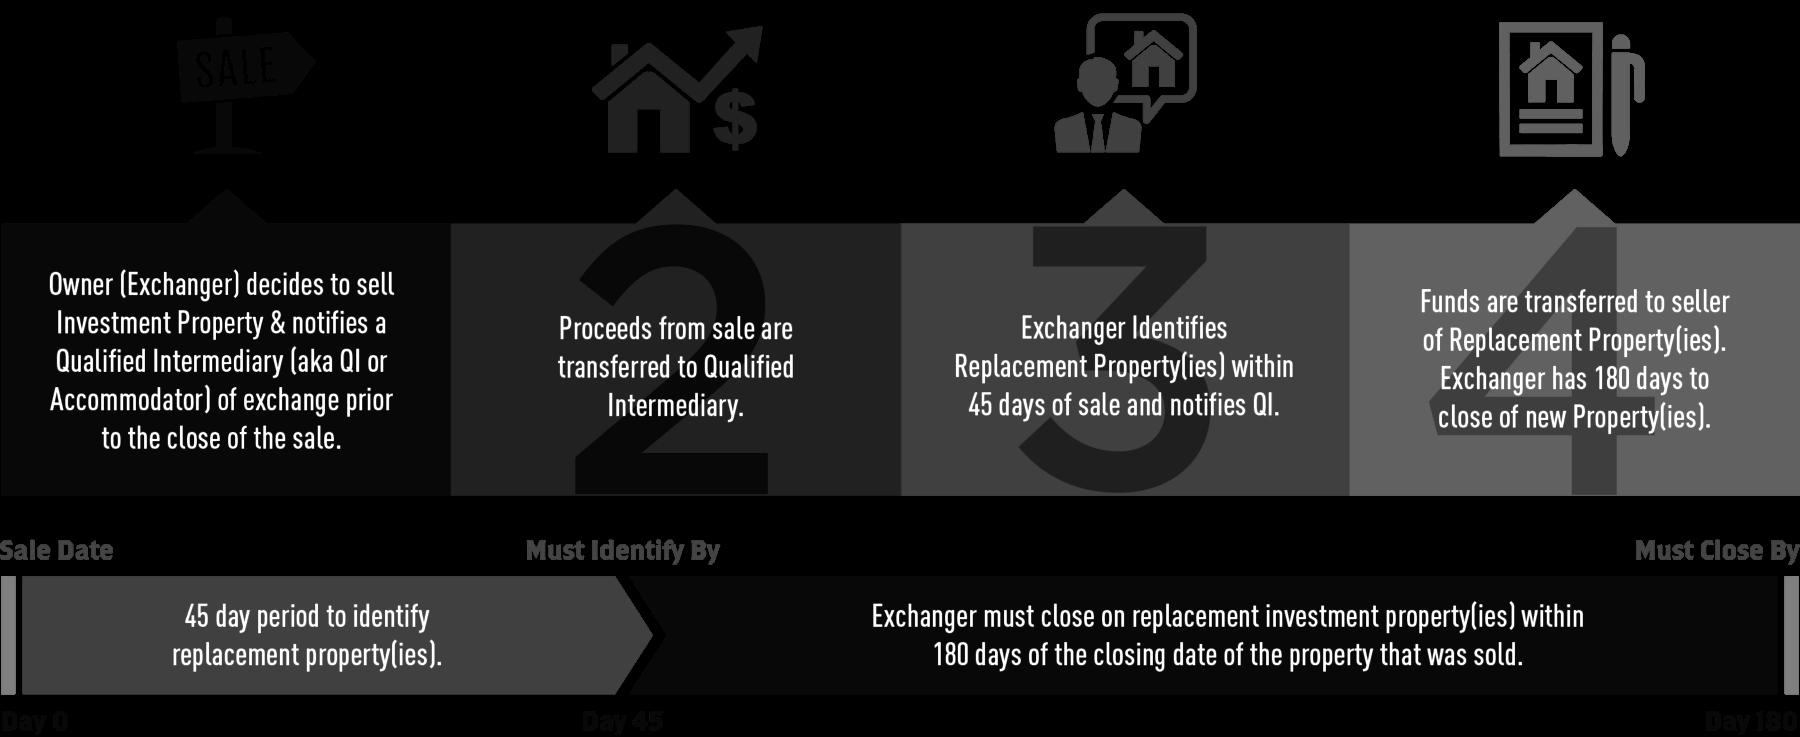 1031 Exchange Rules - 세금이연환환